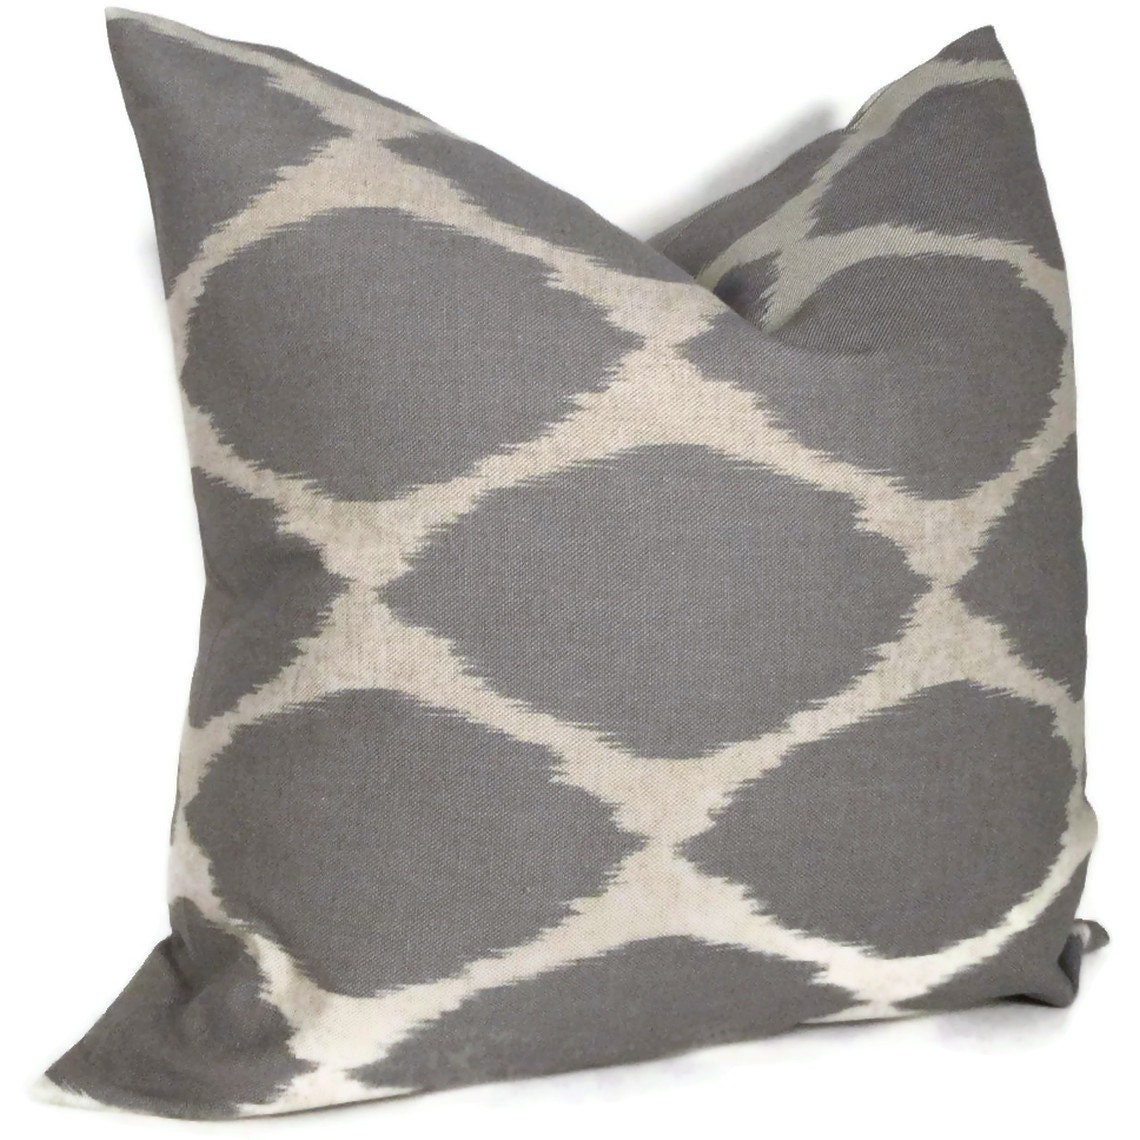 Decorative Pillows At West Elm : West Elm Gray Ikat Decorative Pillow Cover Lumbar Pillow